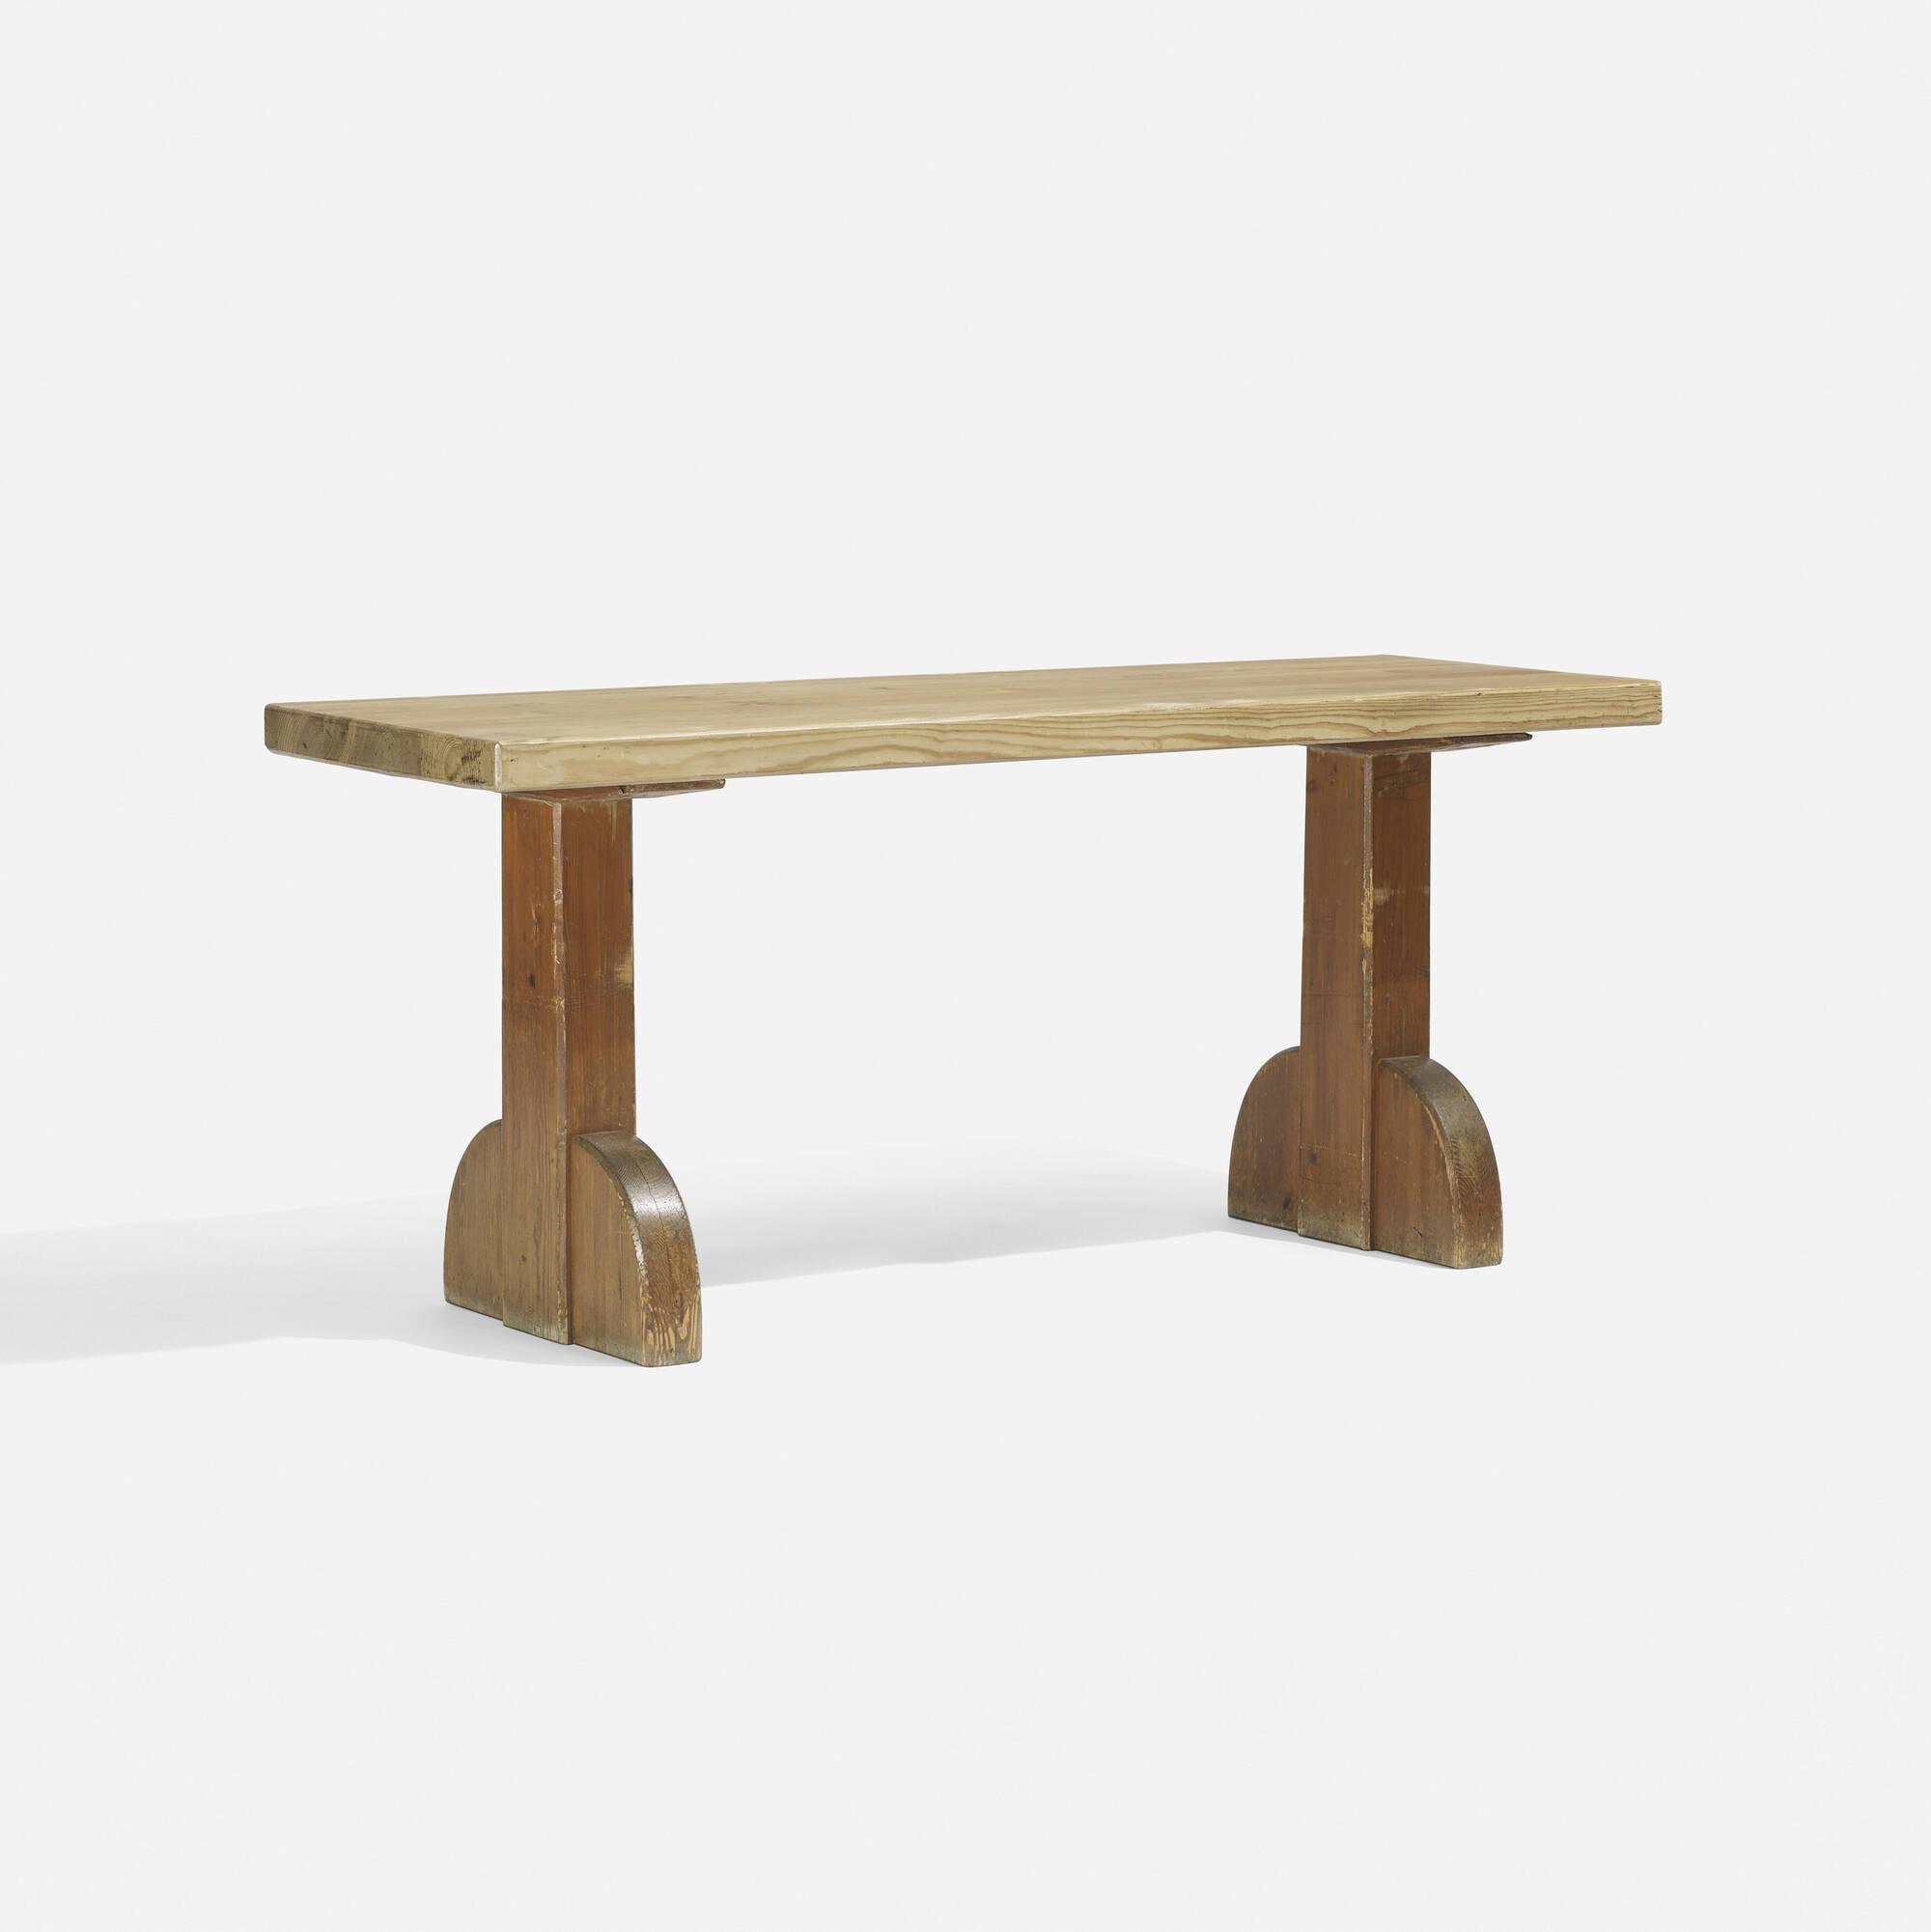 262: Axel Einar Hjorth / Sandhamn table (1 of 2)